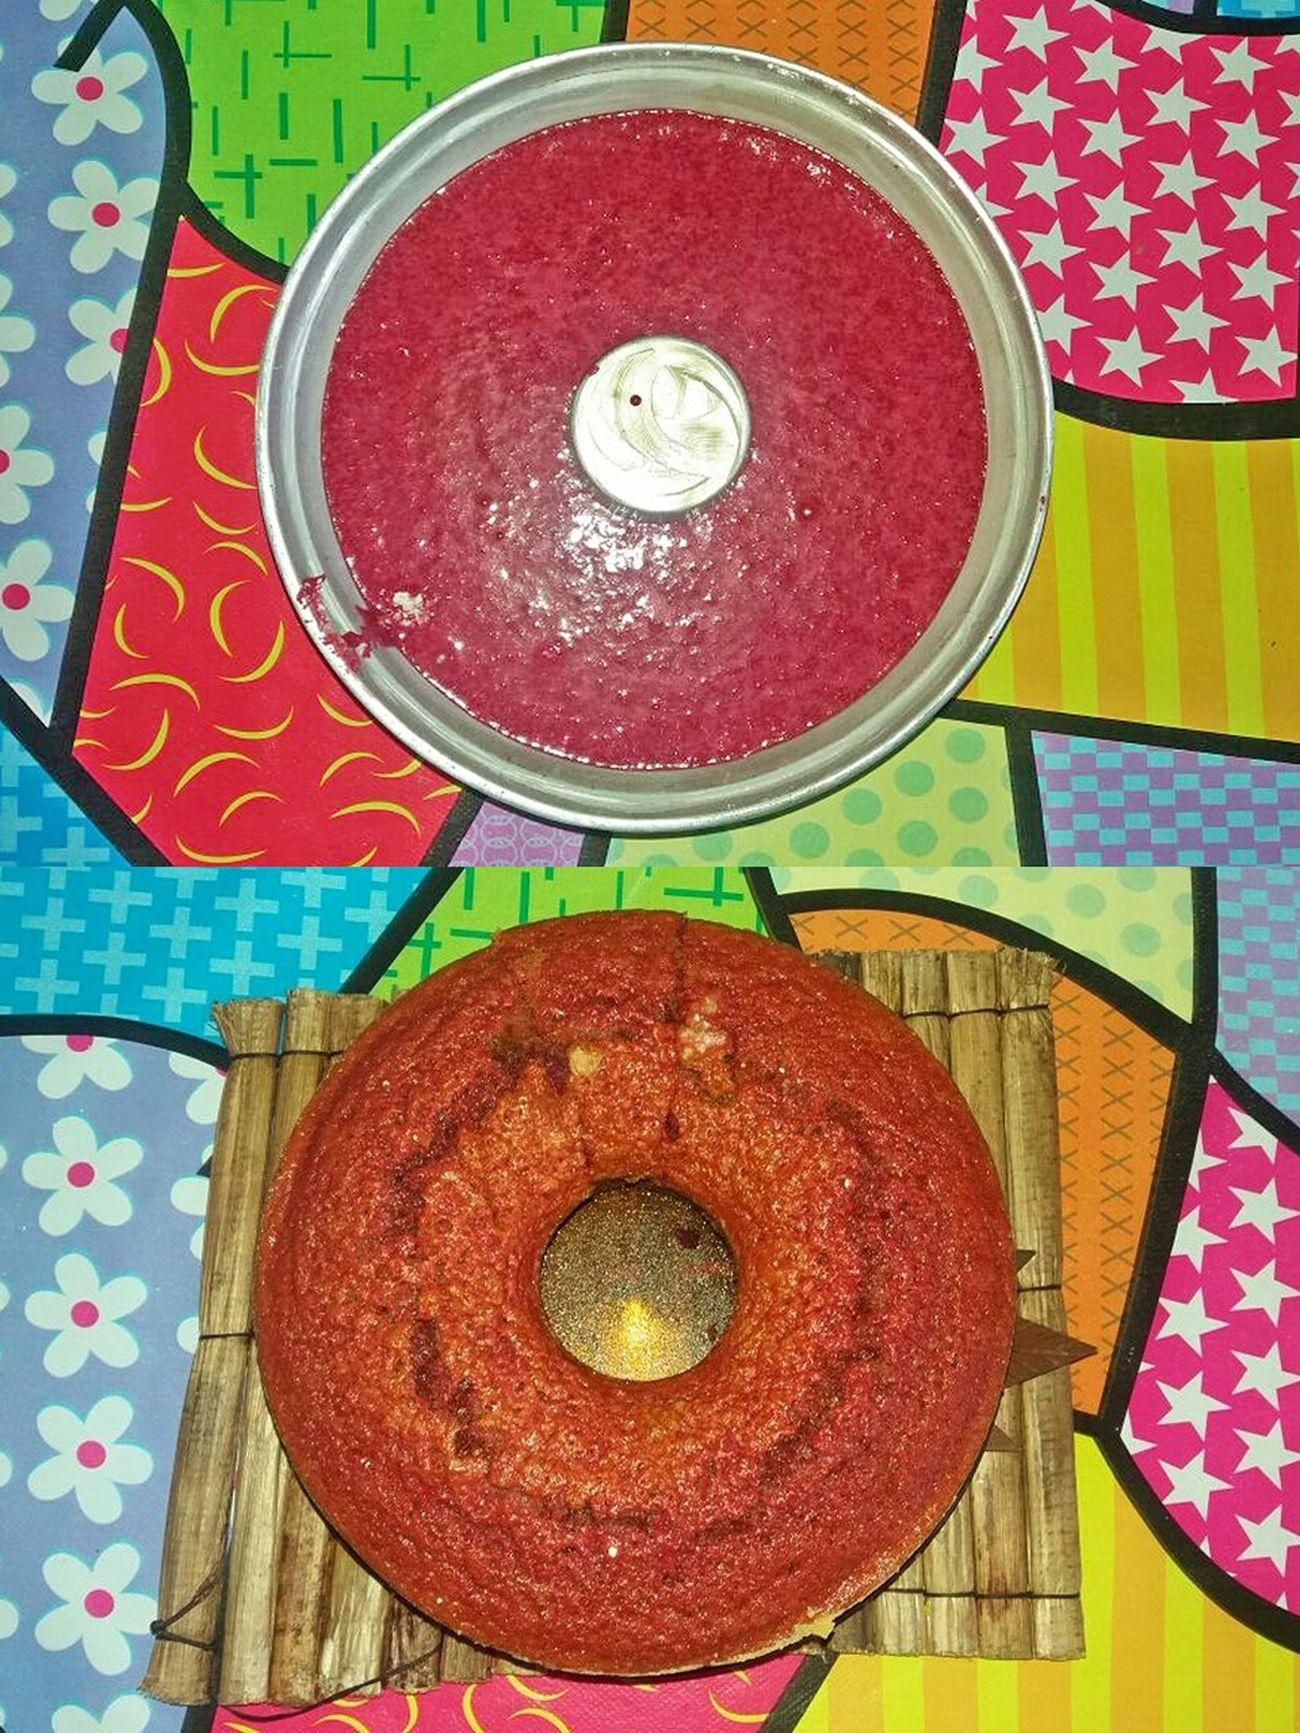 Mycookingtime Delicious ♡ Beet Cake Redcake Bolo De Beterraba Brazilian Afternoon Breakfast